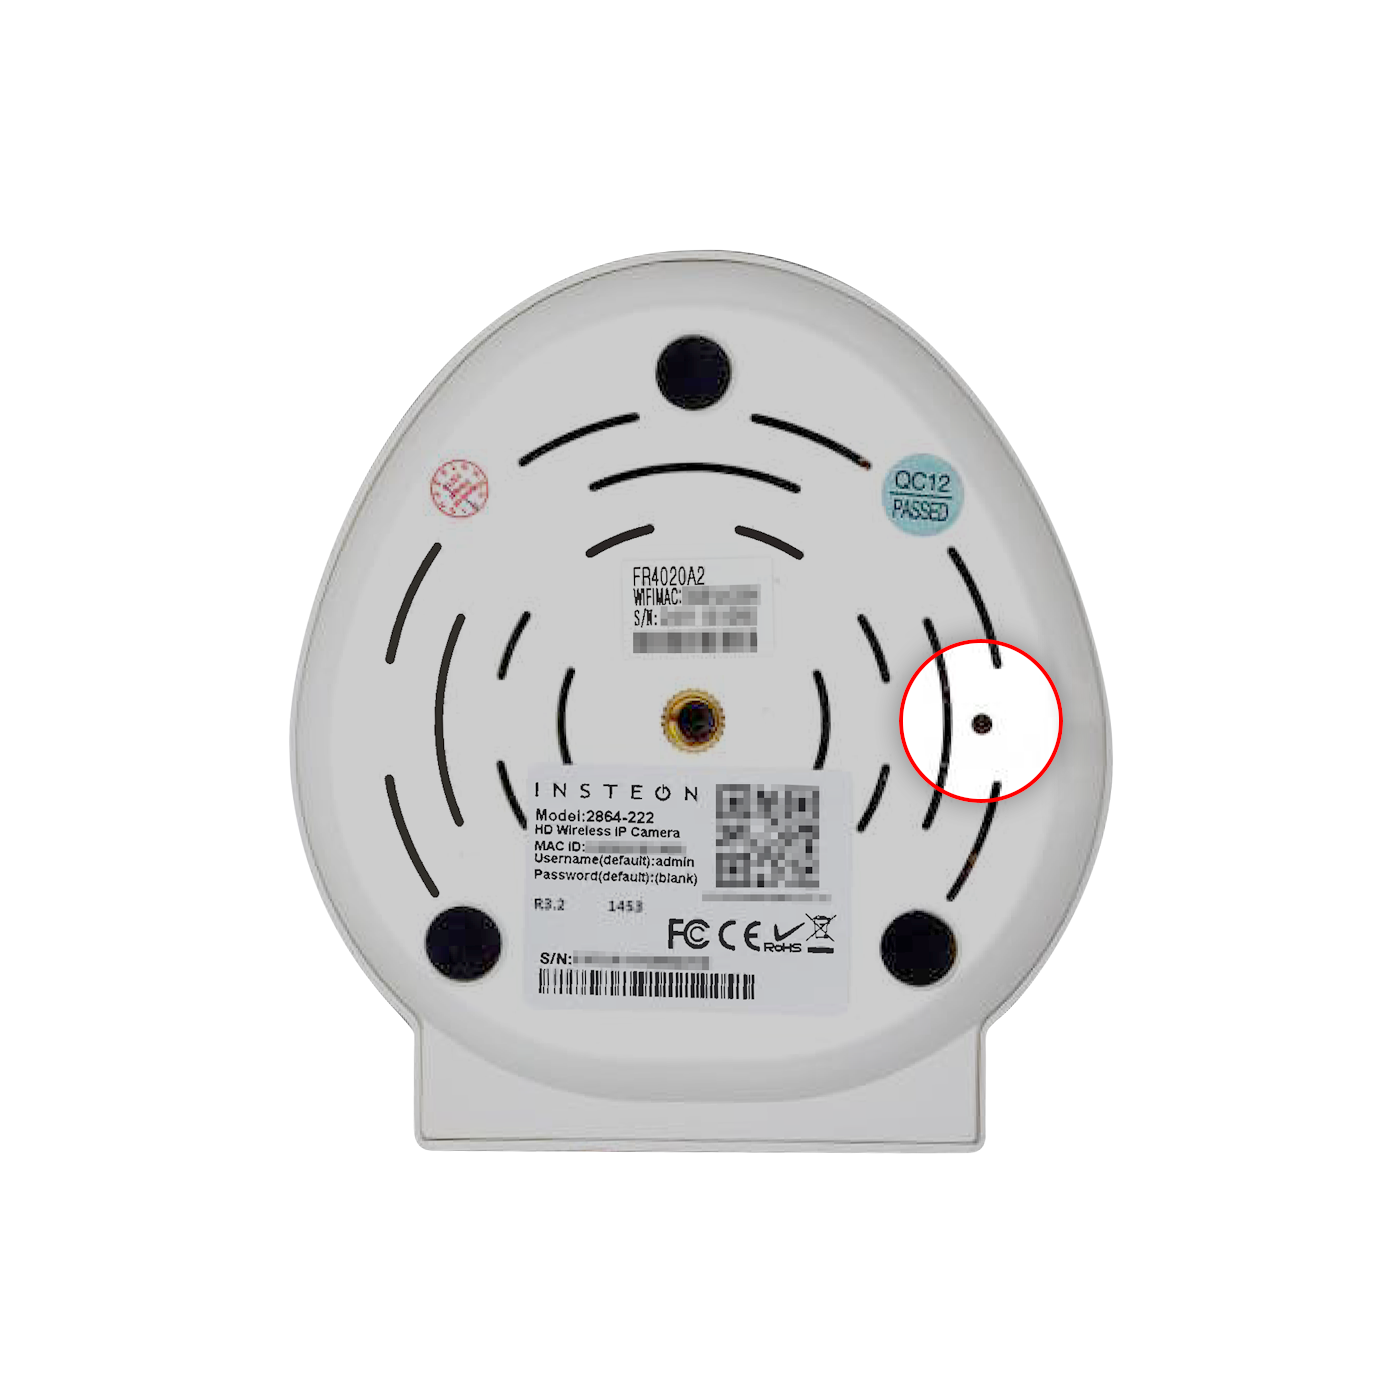 Factory Reset an Insteon Wi-Fi Camera — Insteon